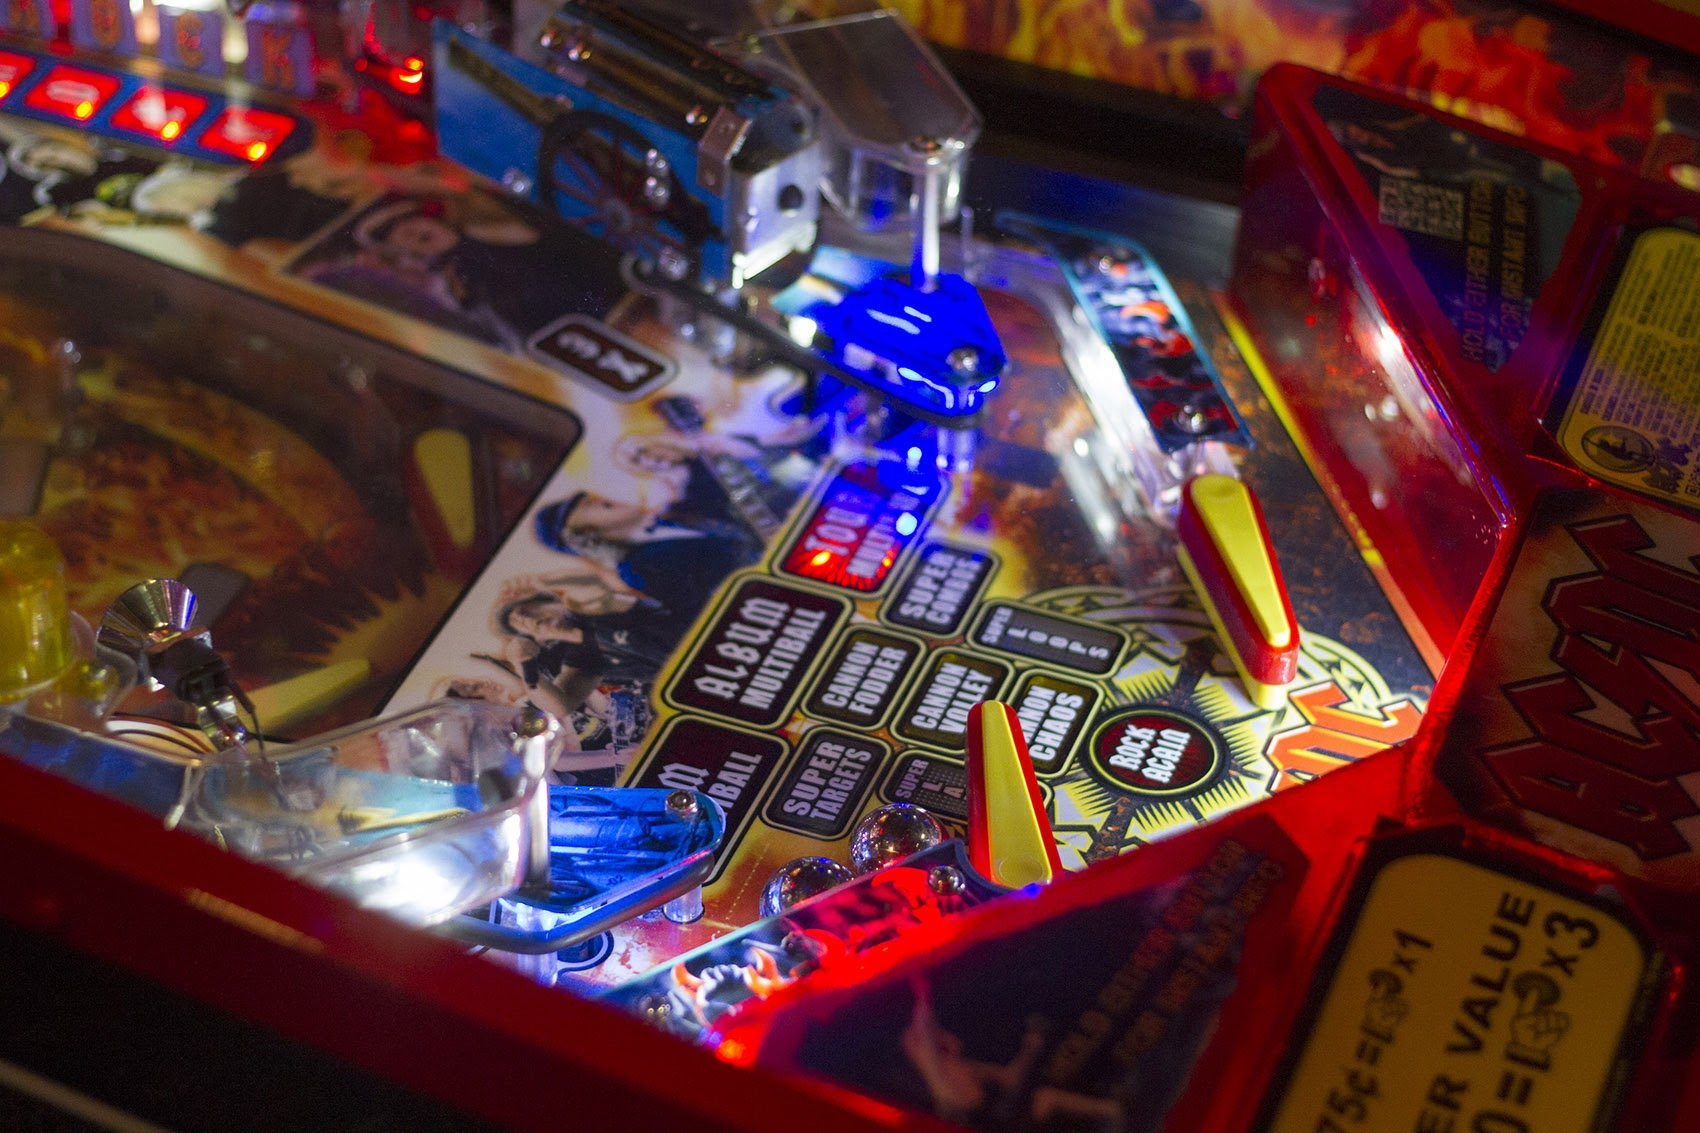 AC/DC pinball machine. (Joe Difazio for WBUR)